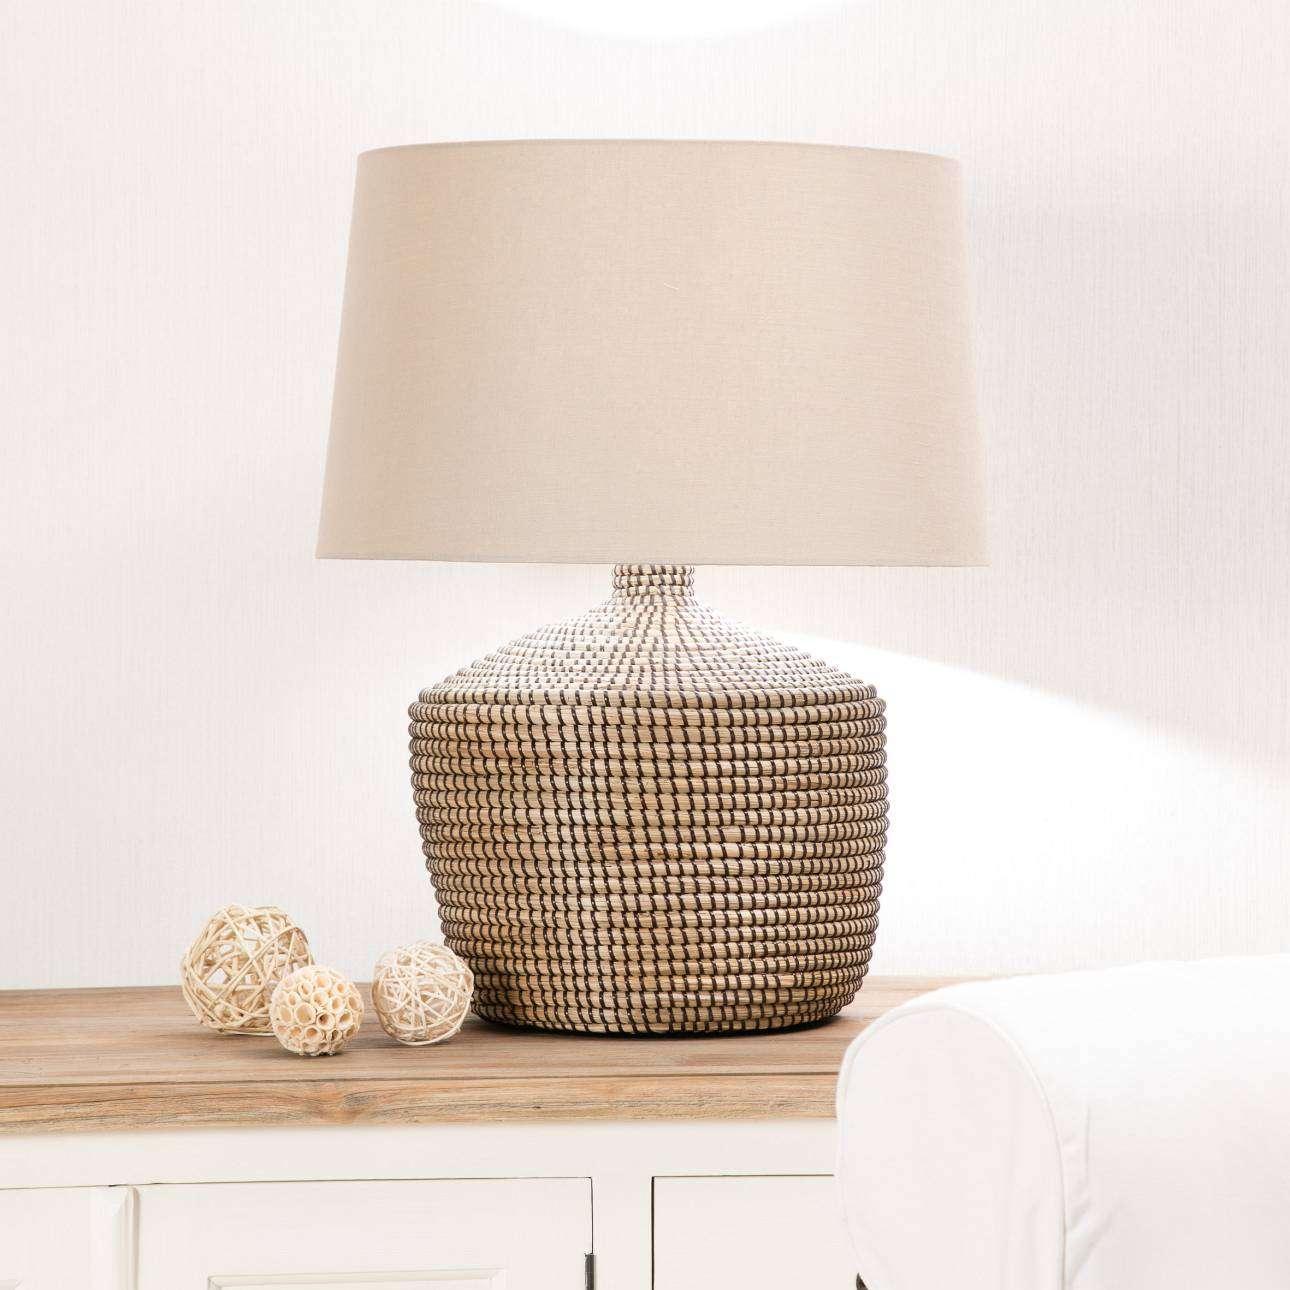 Lampa Coastal Brown výška 62cm